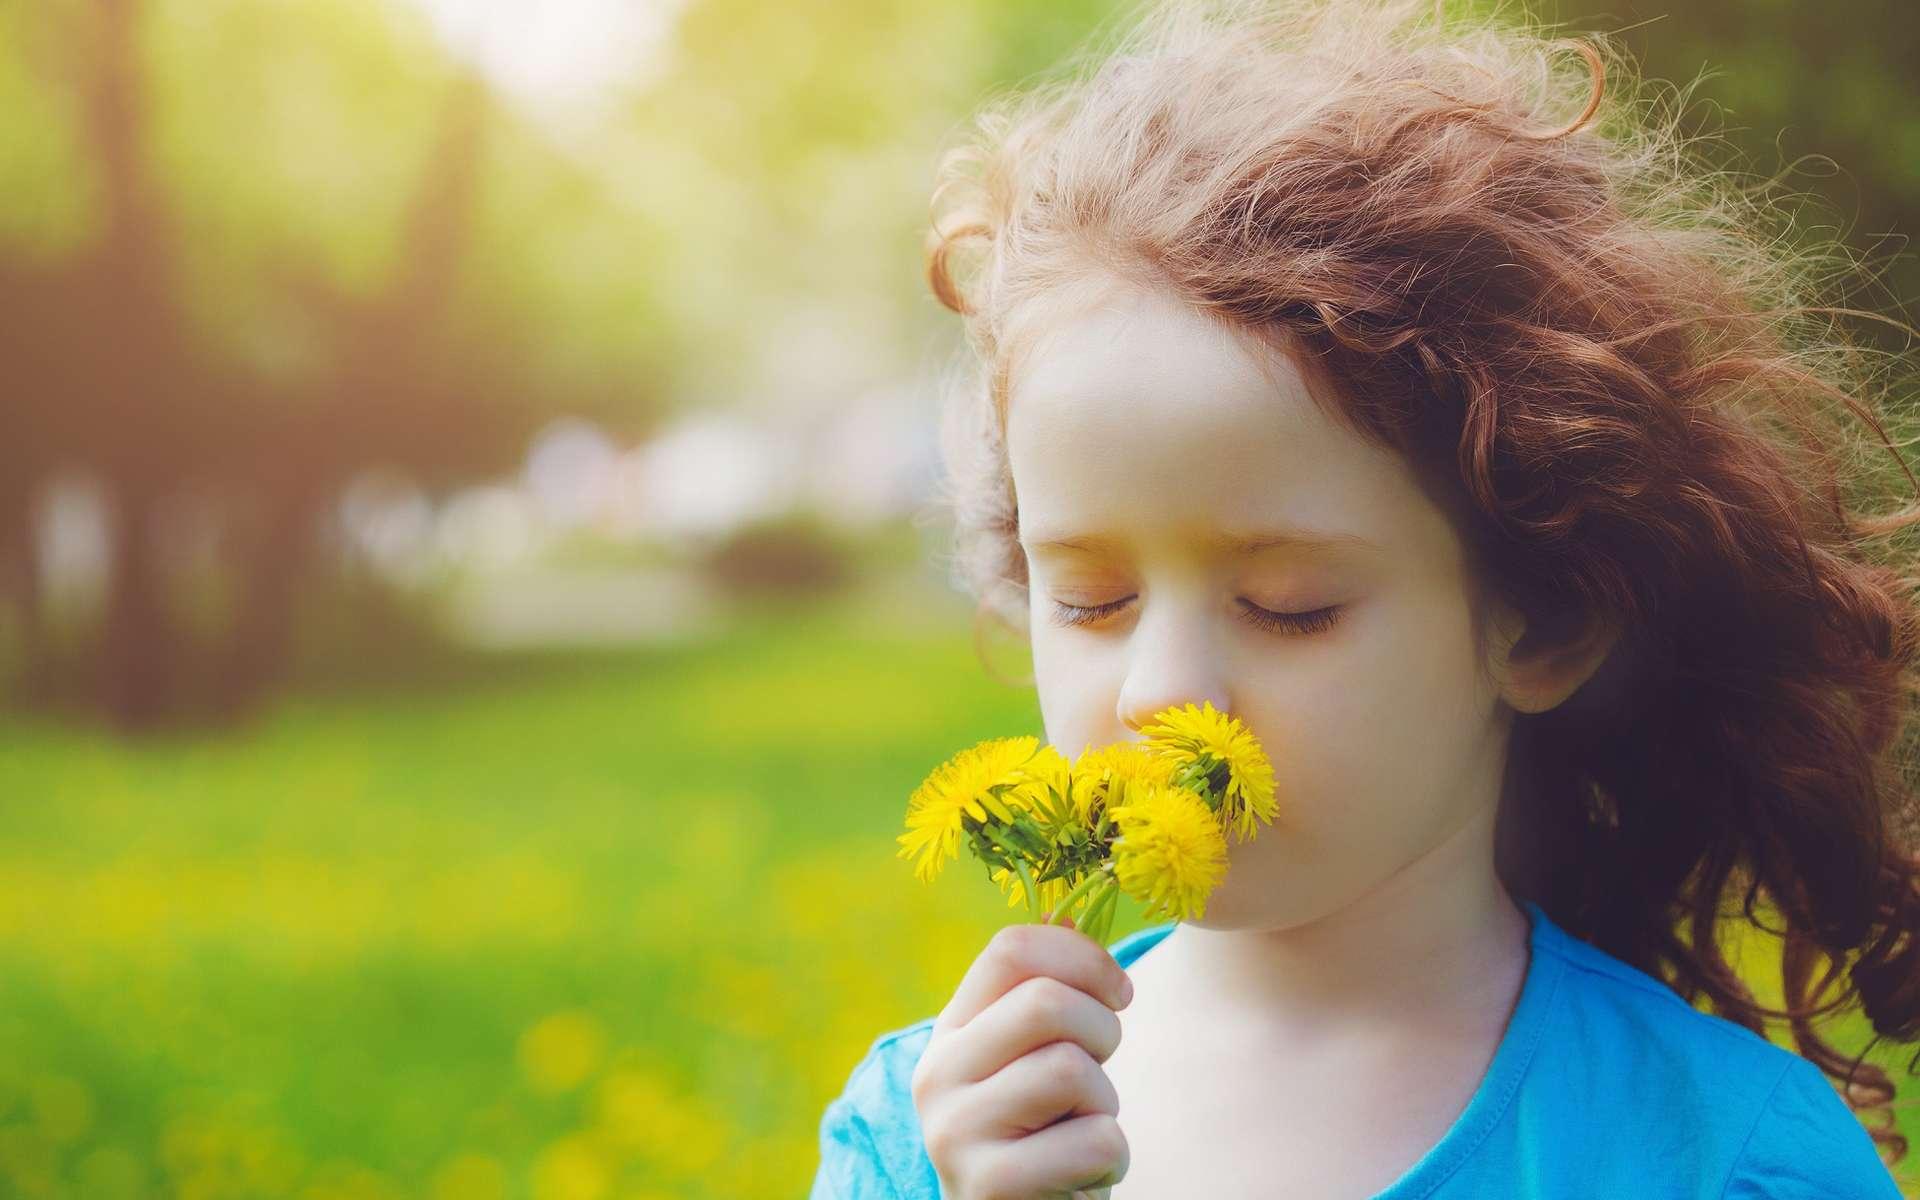 Des allergènes, comme les pollens, peuvent favoriser la crise d'asthme. © Yuliya Evstratenko, Shutterstock